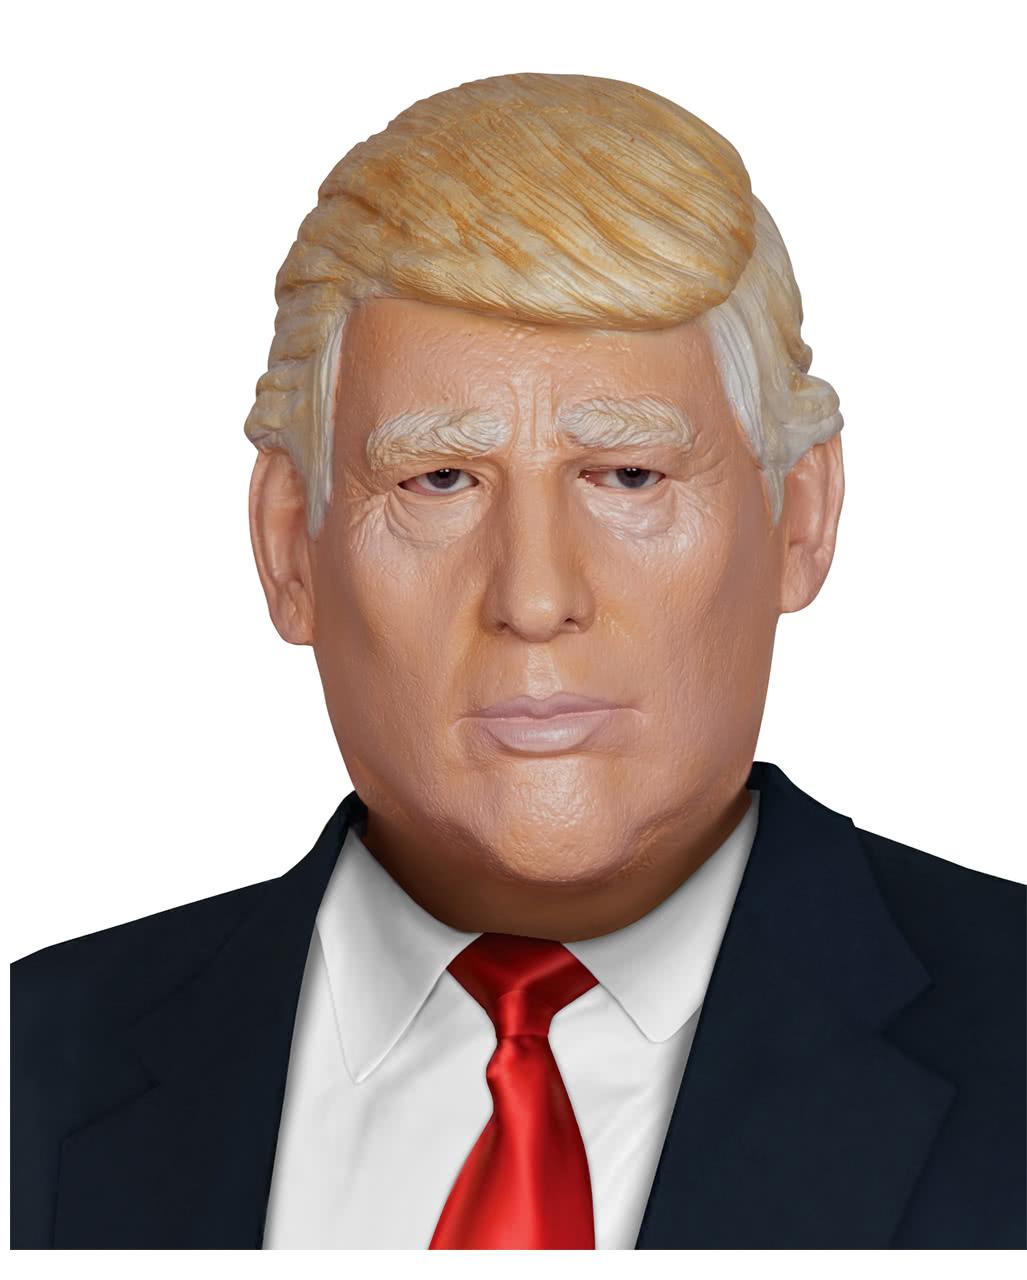 Captain America Donald Trump Superman Kim Jong-un PVC Collectible Figure POP